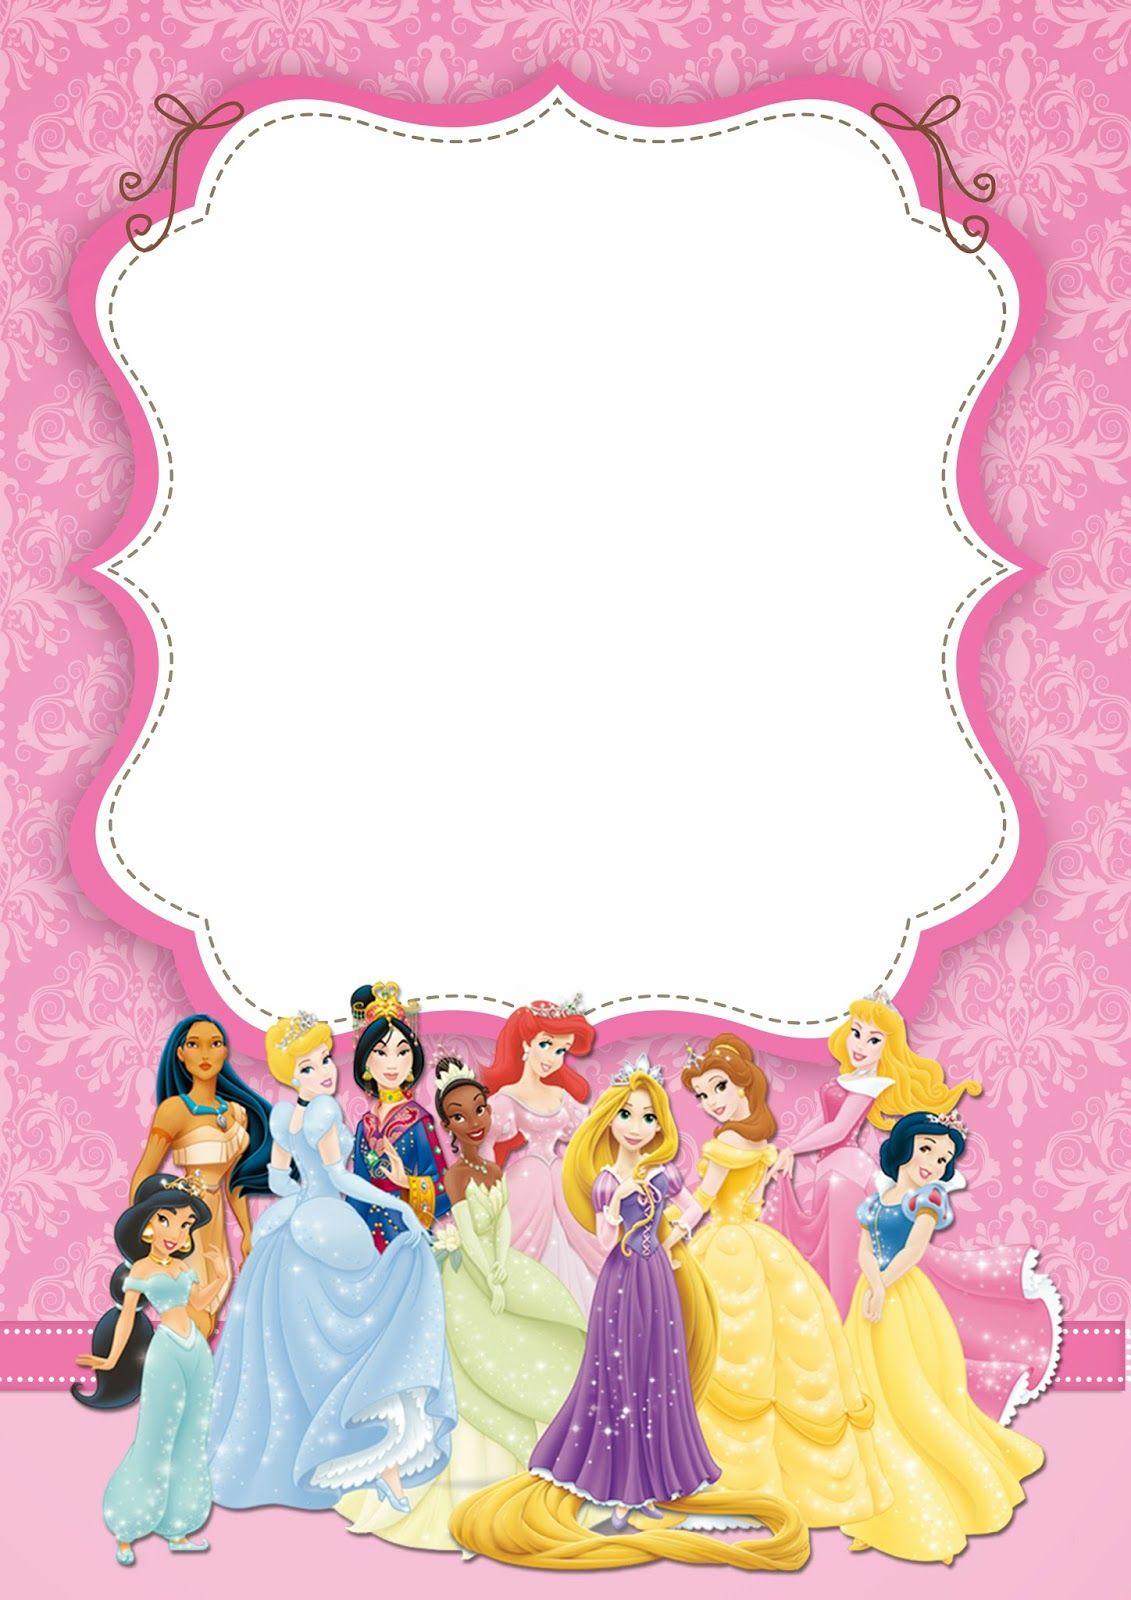 Disney Princess Party: Free Printable Party Invitations.   Oh My - Free Printable Disney Invitations